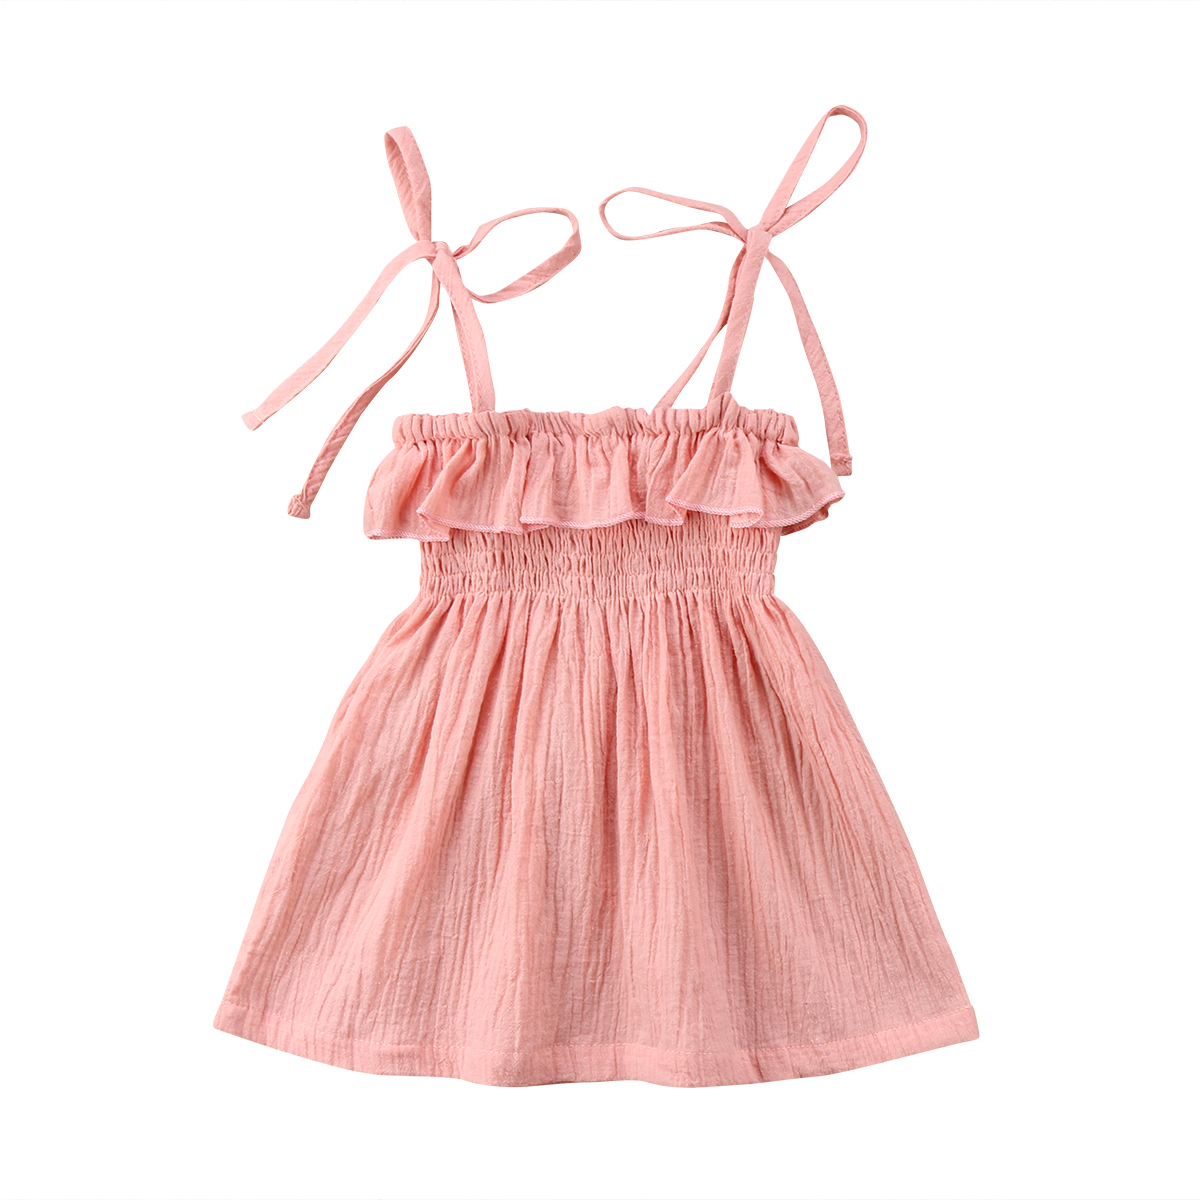 US 2pcs Newborn Kids Baby Girls Flower Party Dress Pageant Princess Gown Dress